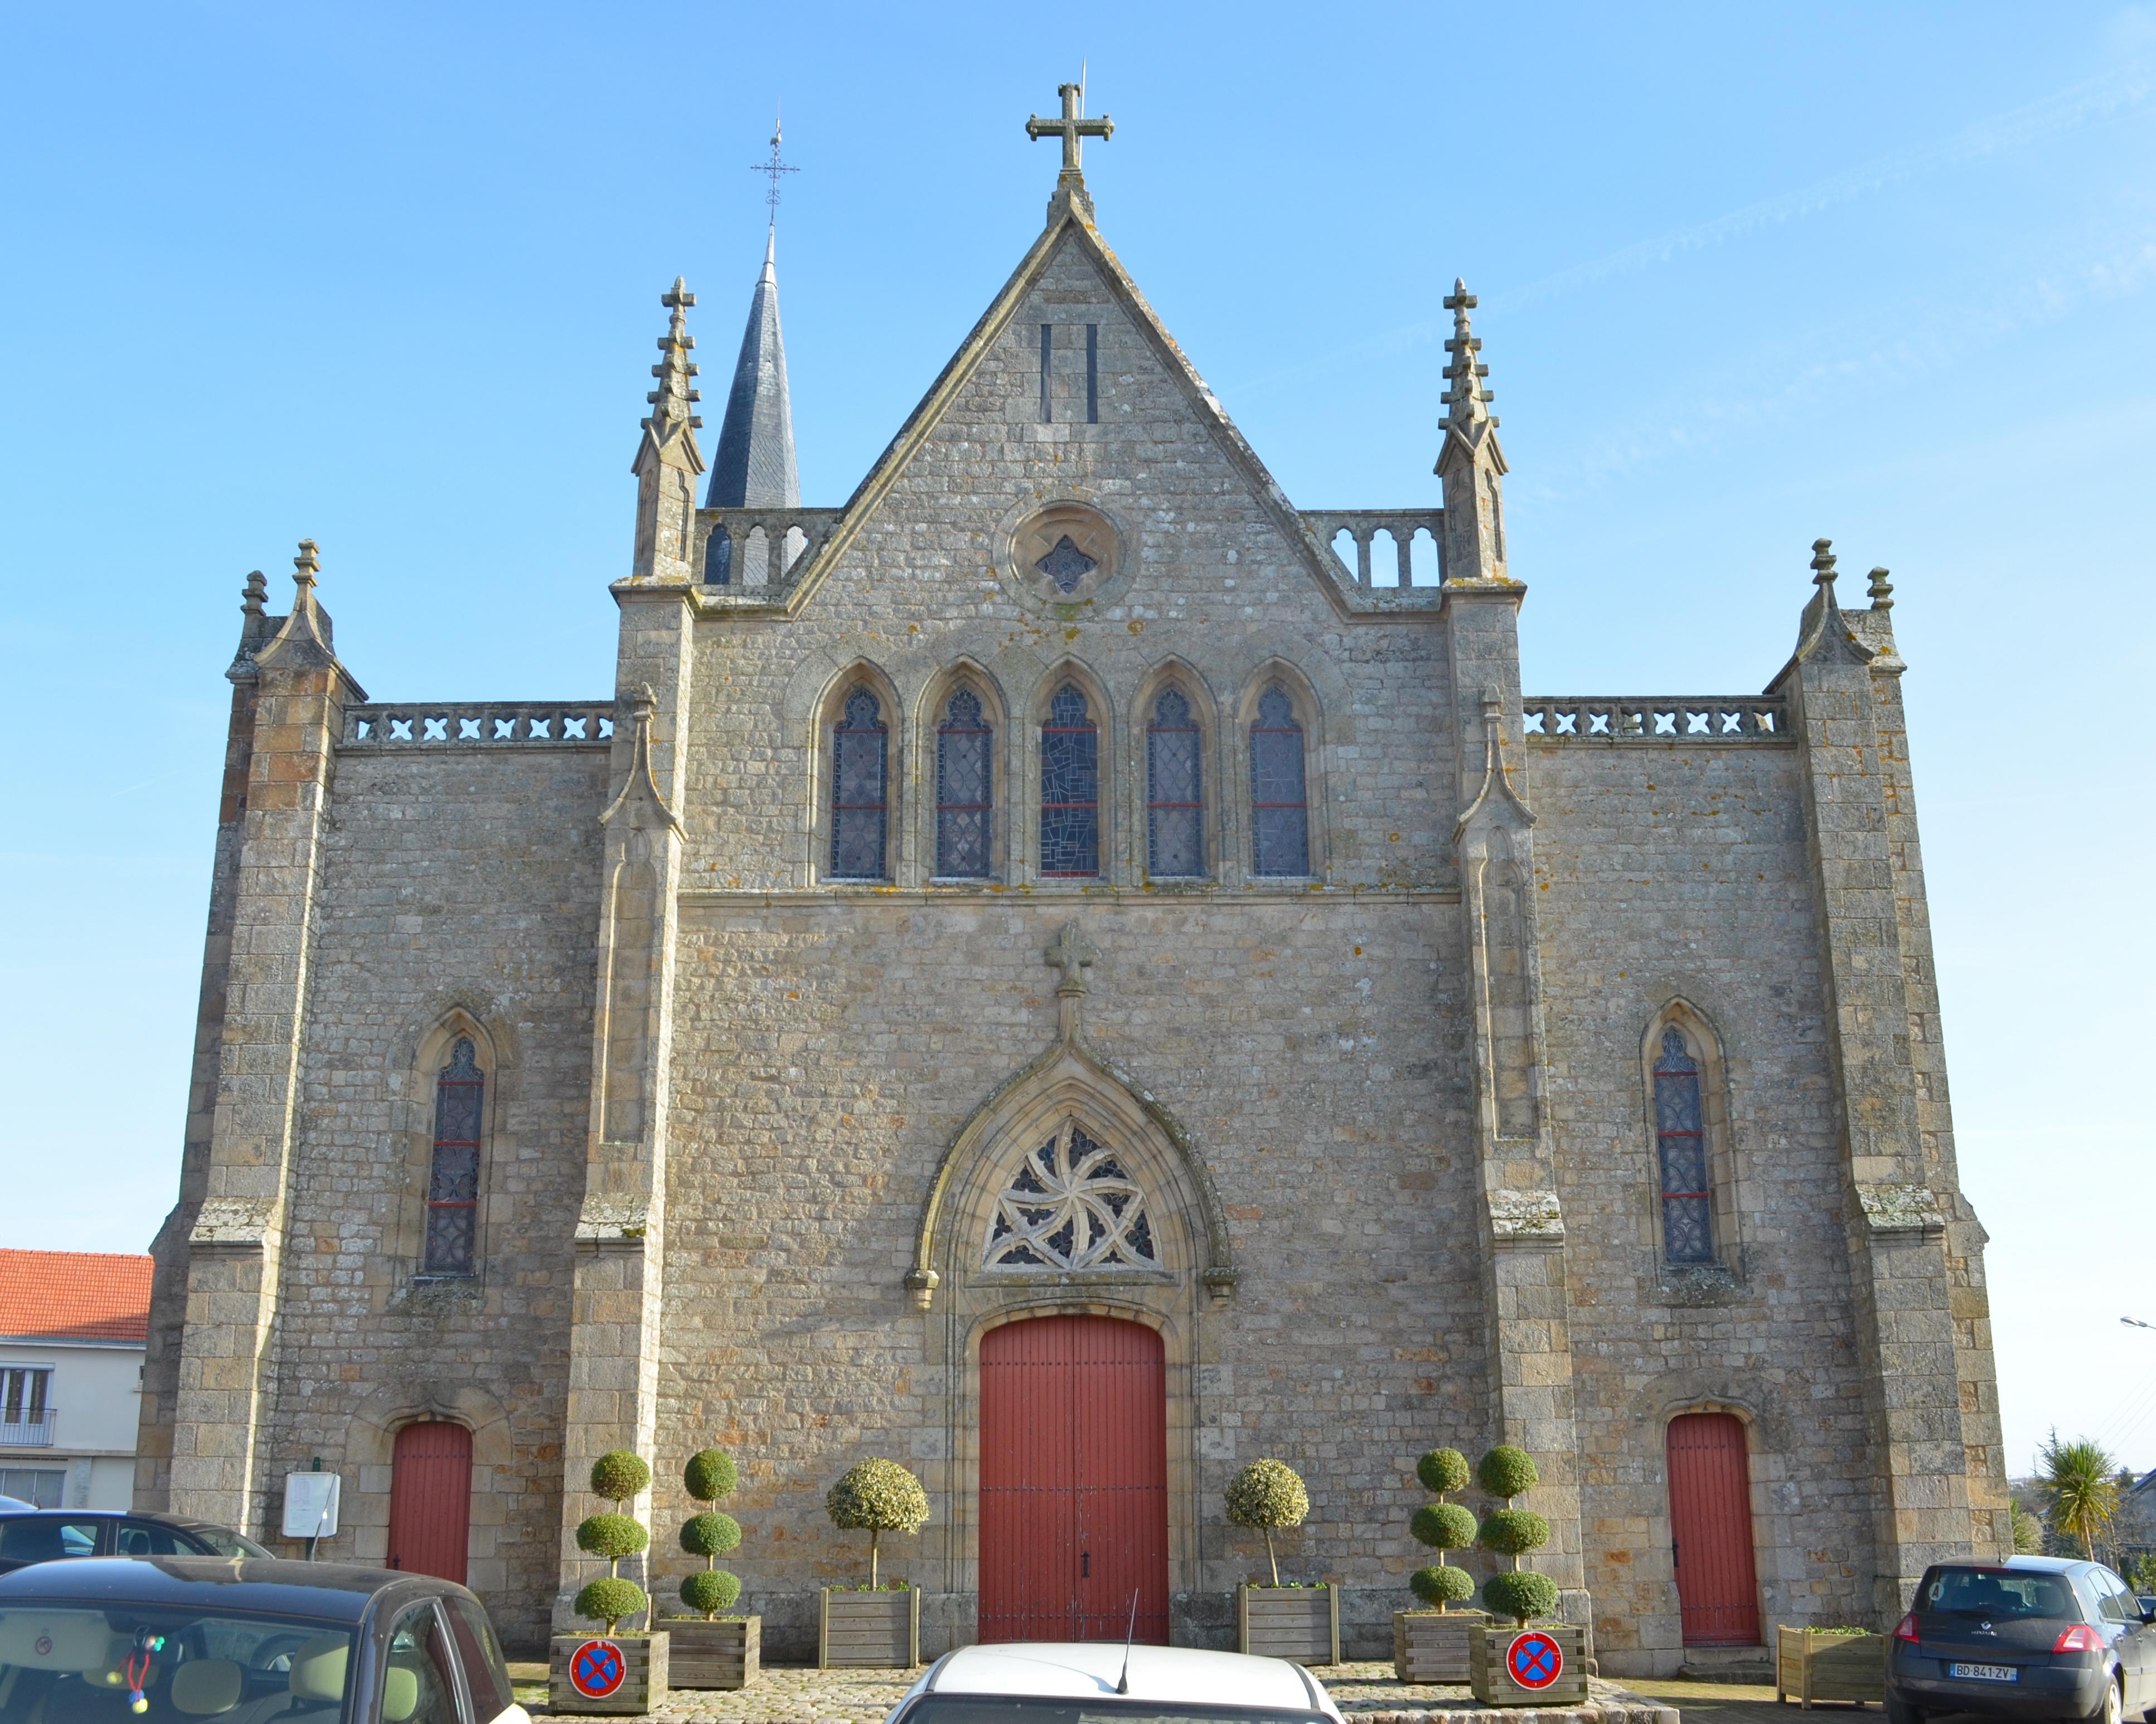 File:Saint-Herblain - Eglise Saint Hermeland (2).jpg - Wikimedia Commons